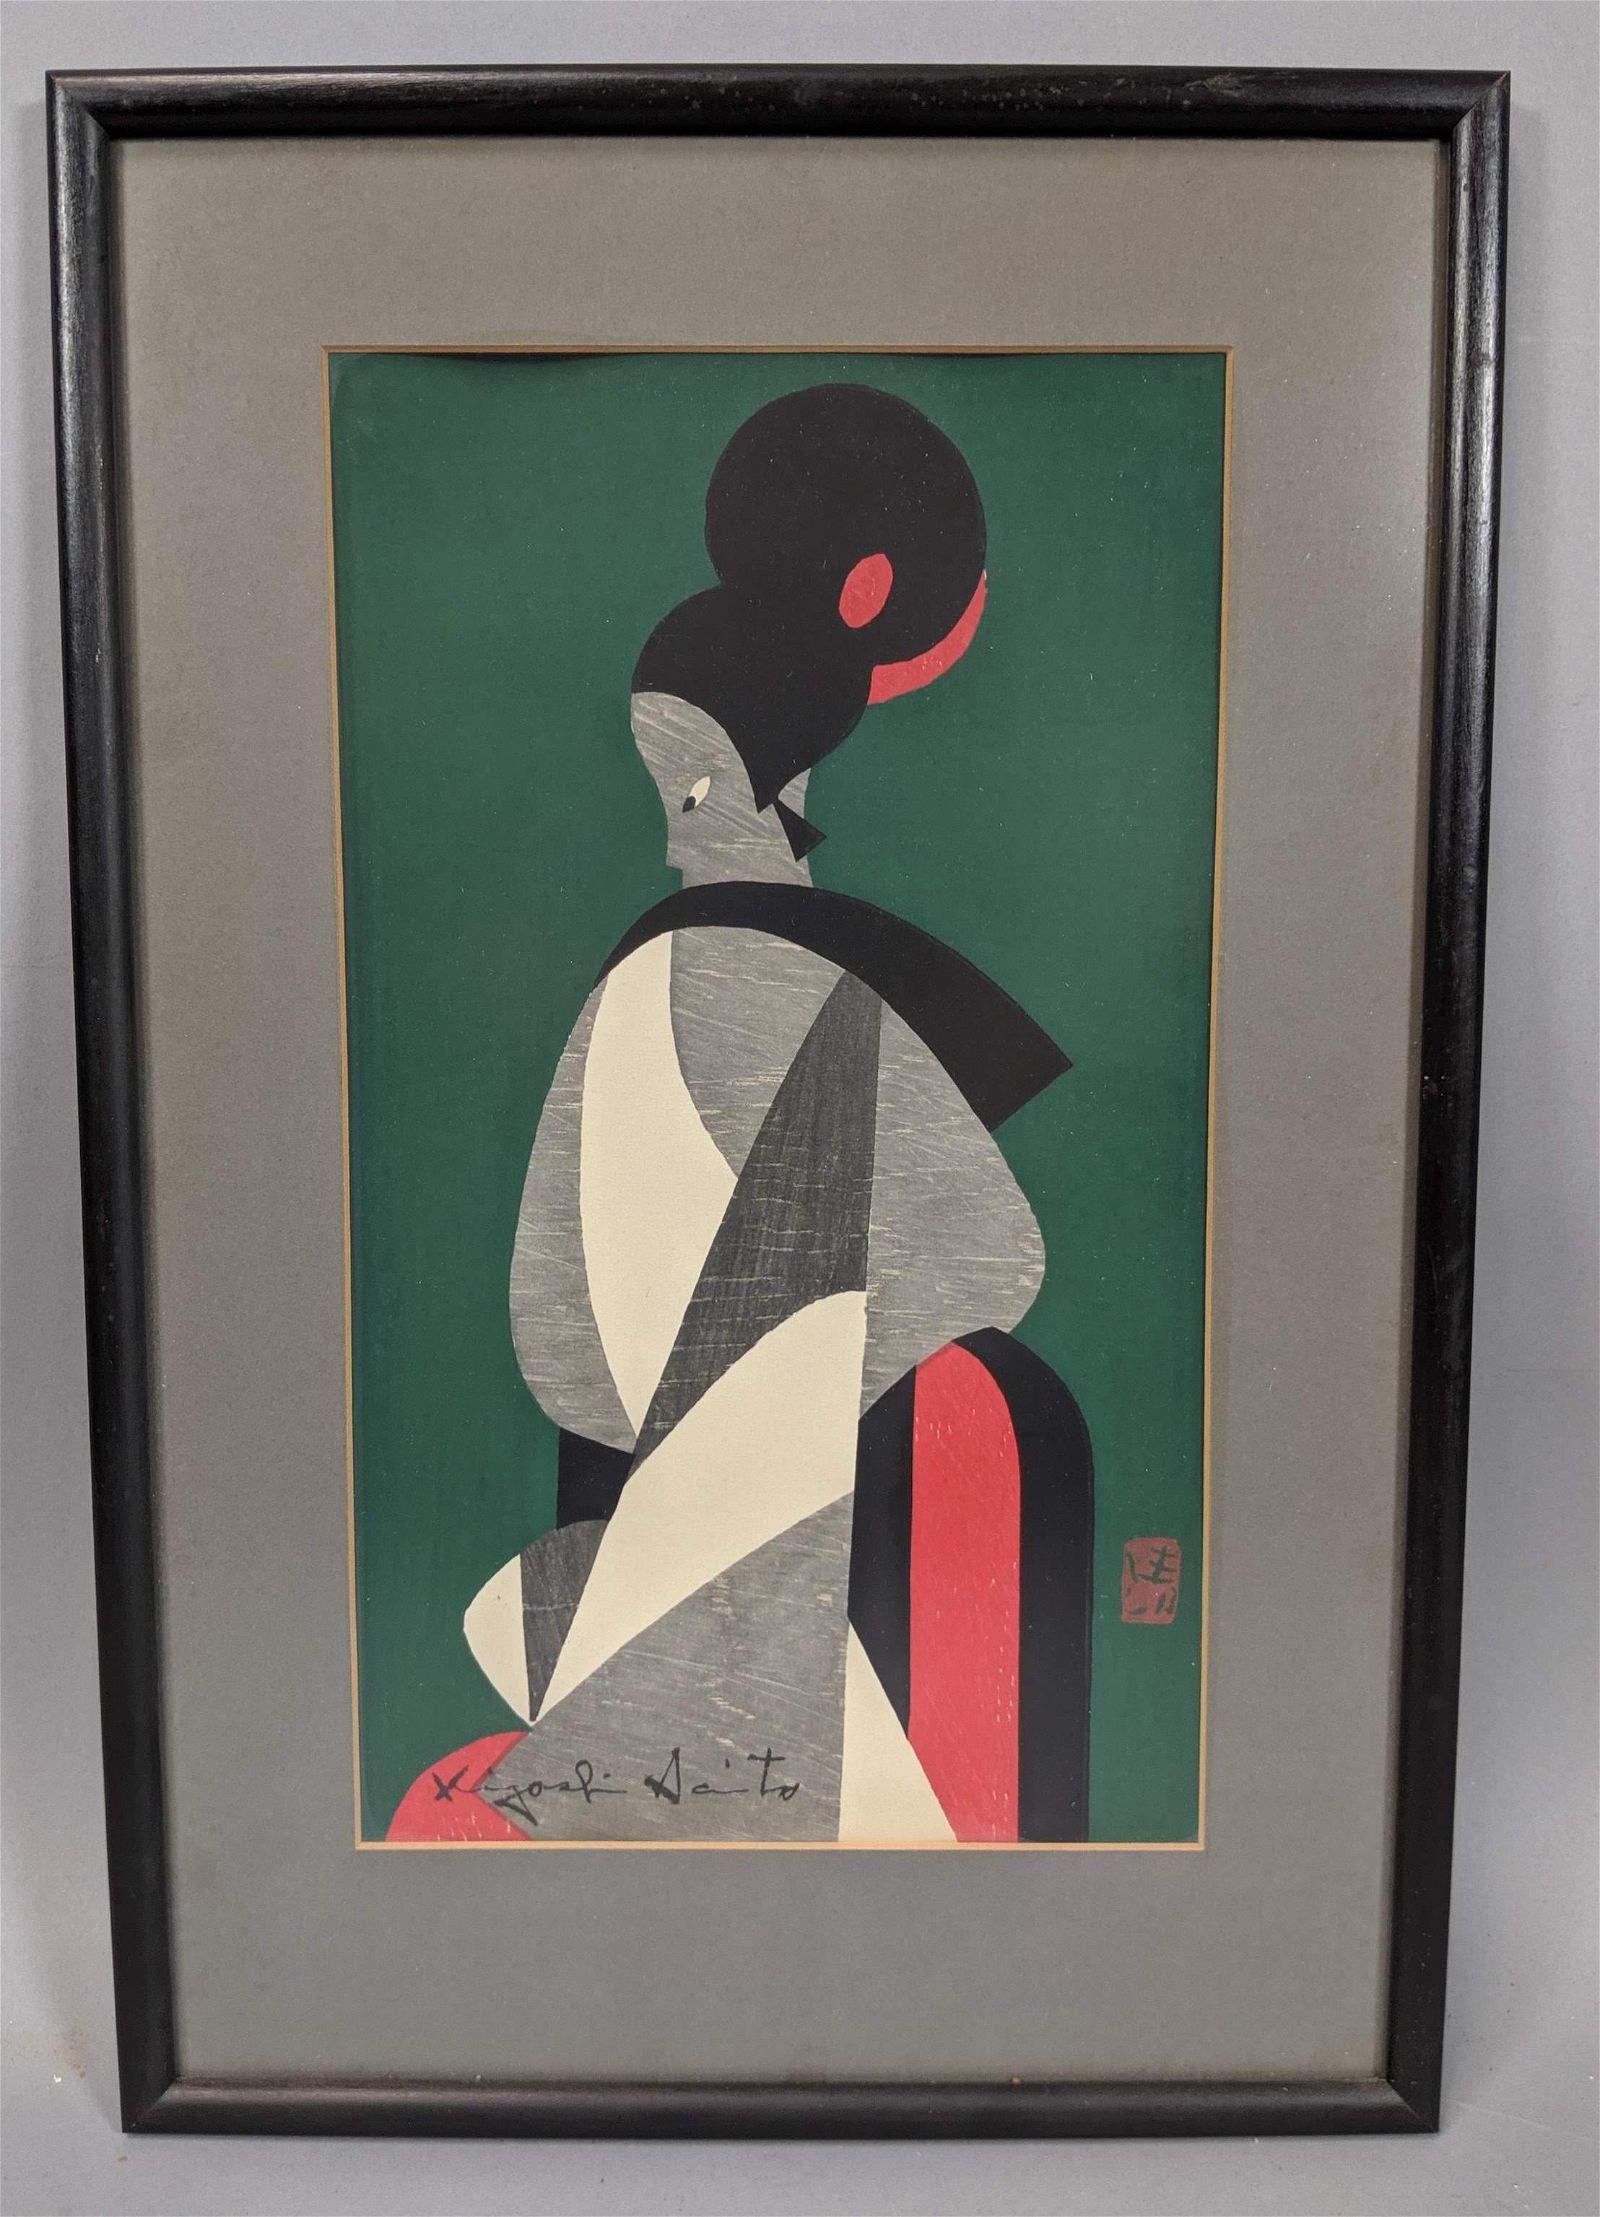 KIYOSHI SAITO Modernist Japanese Woodblock Print.